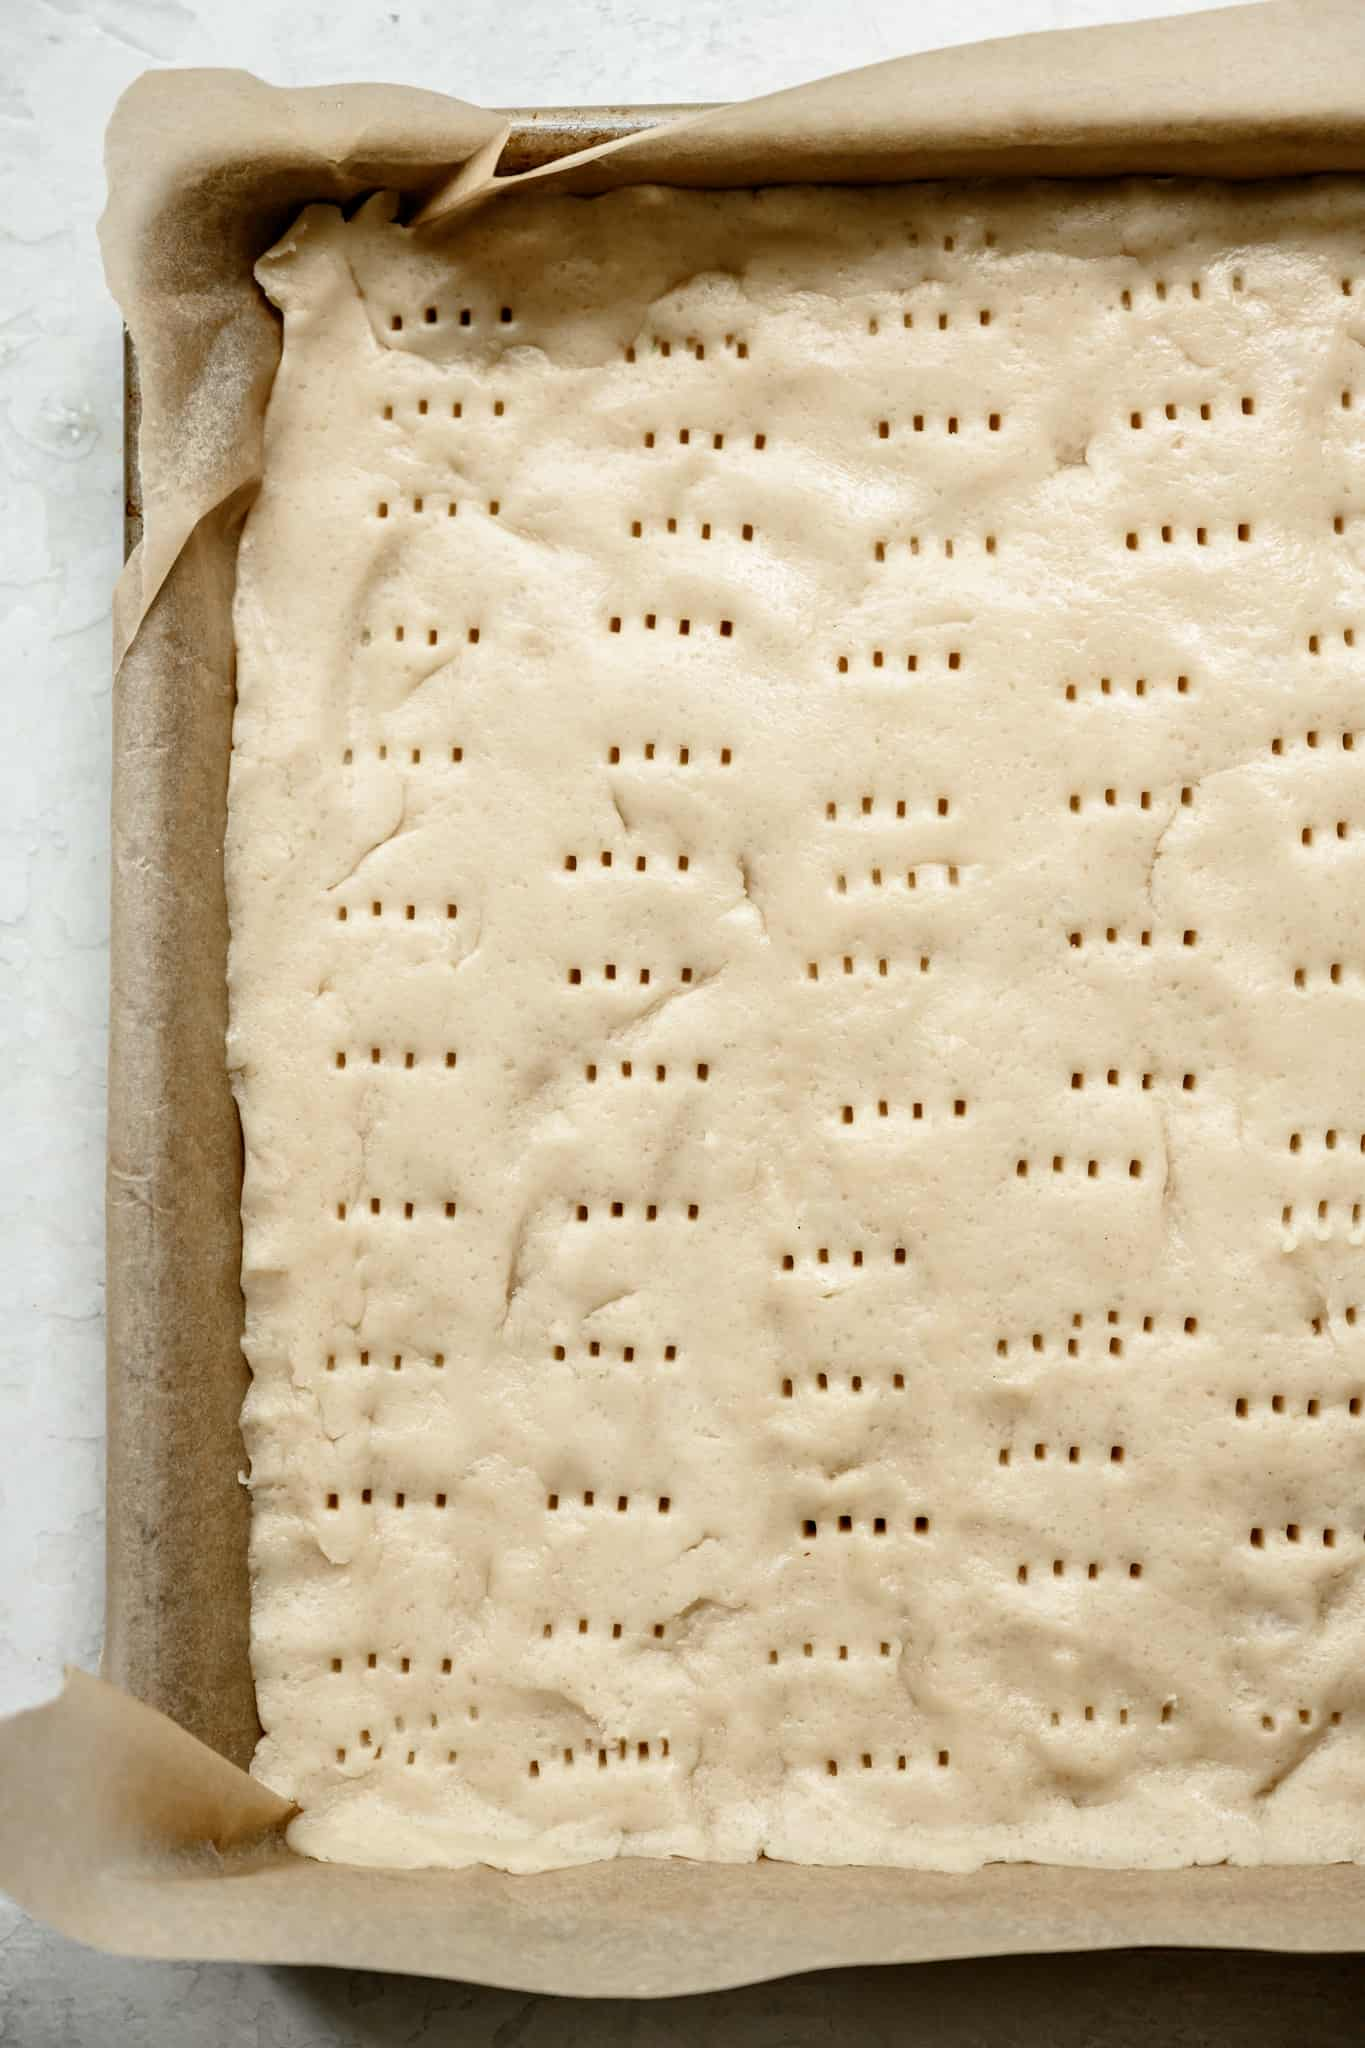 overhead view of gluten free shortbread before baking